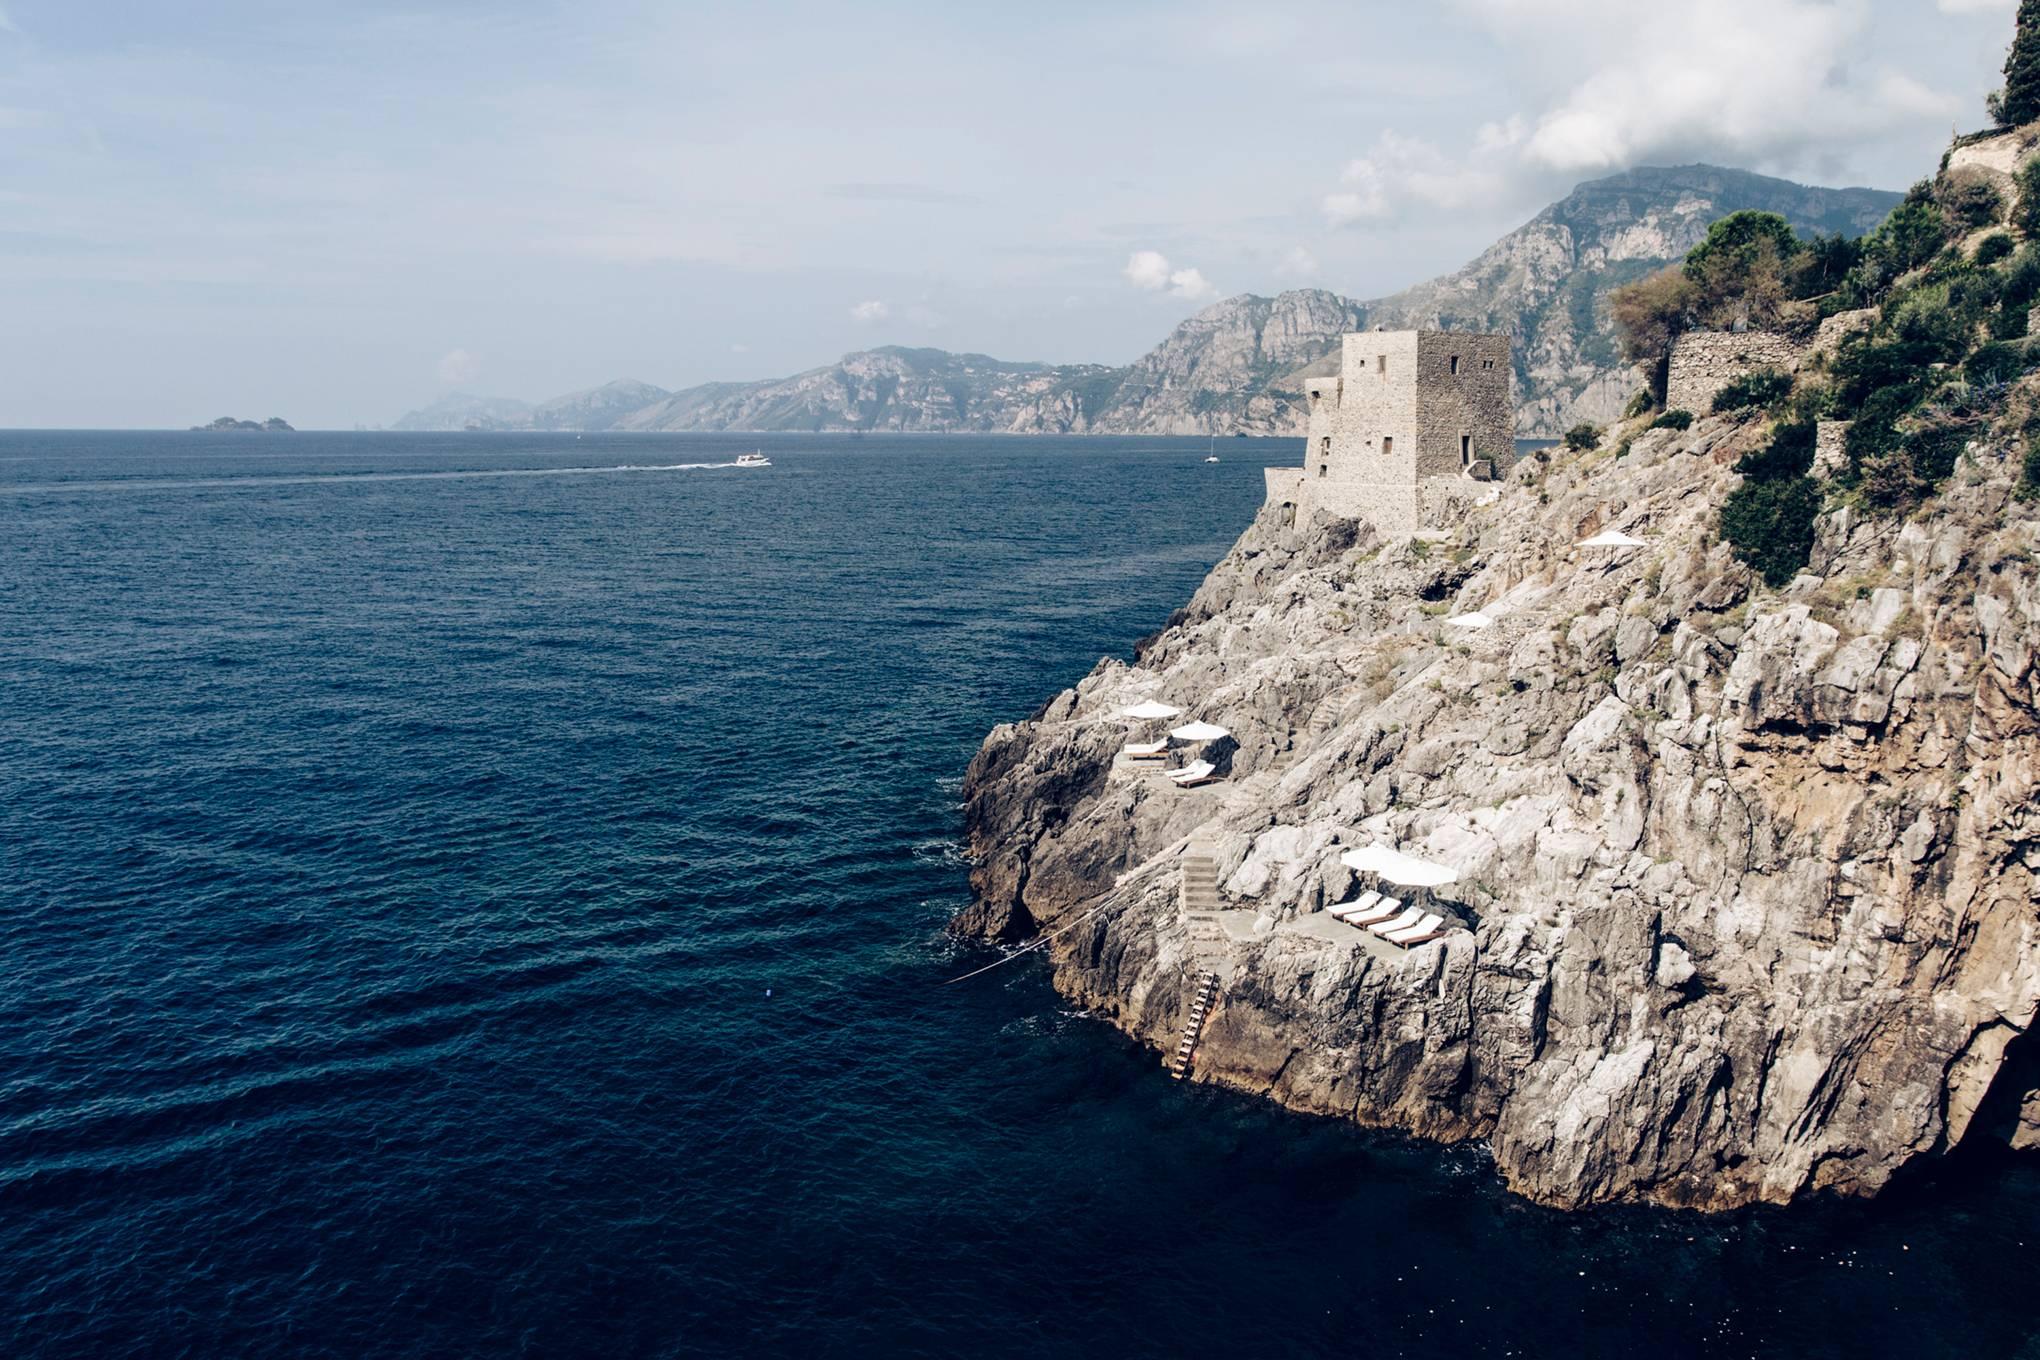 Casa Privata, Praiano: the most low-key hideout on the Amalfi Coast